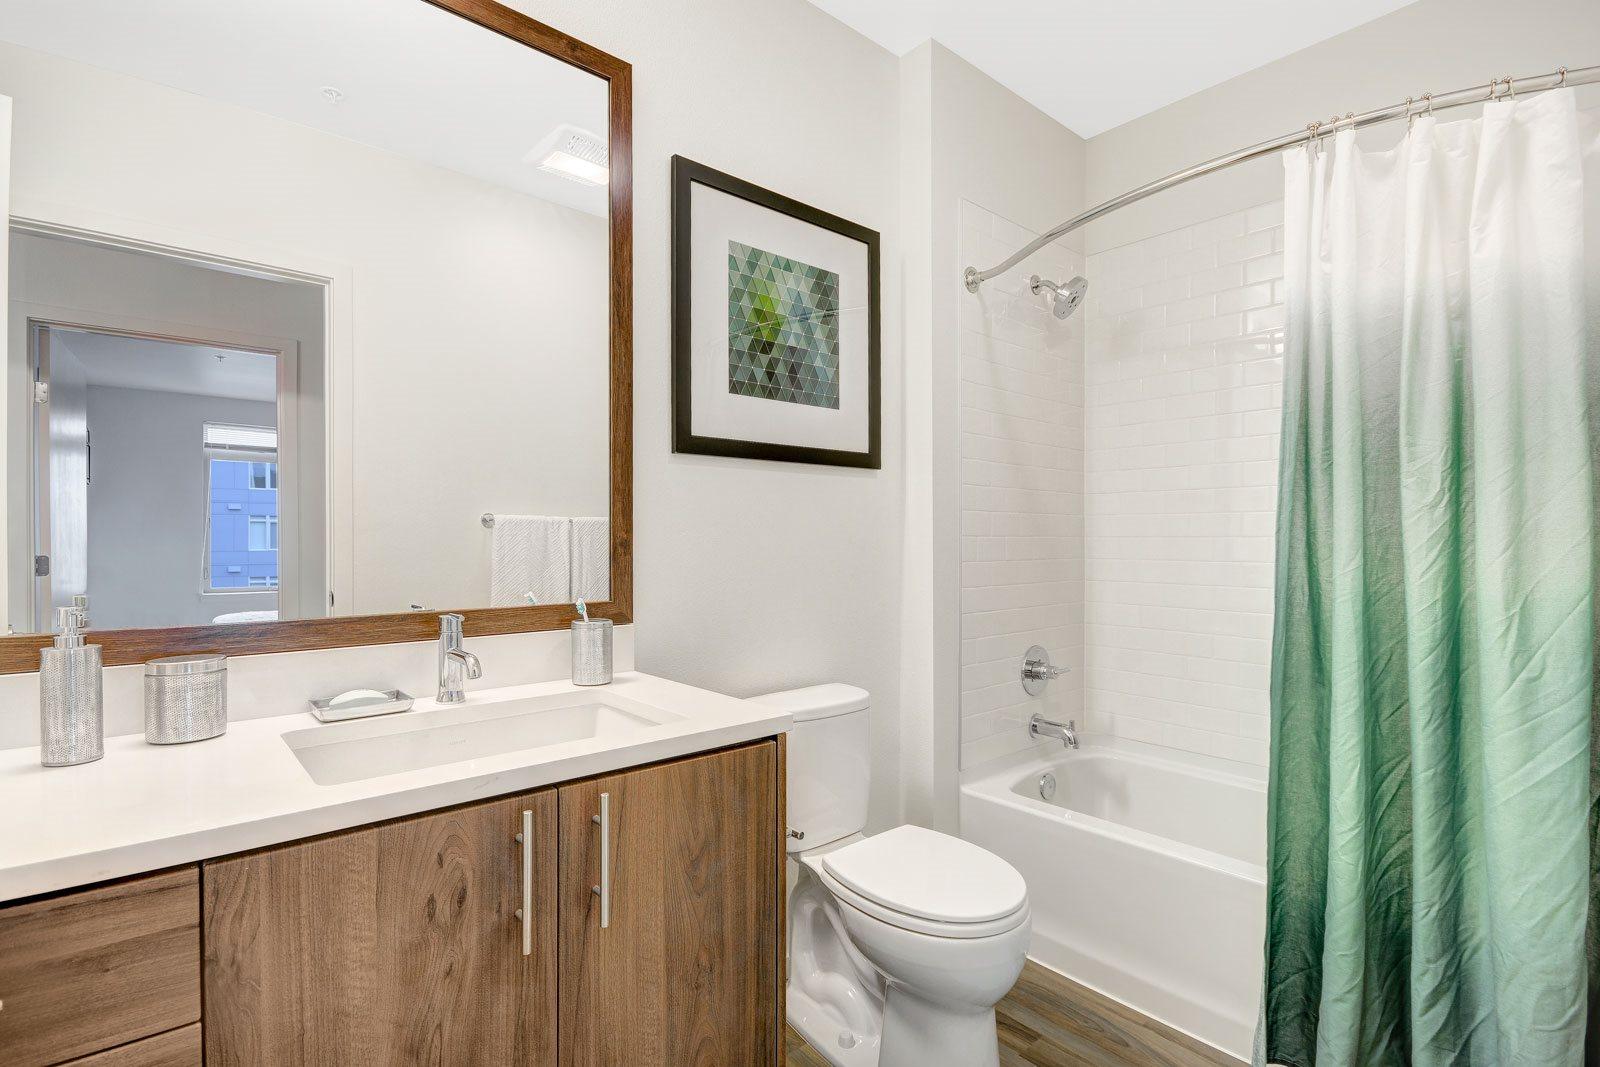 Custom Framed Bathroom Mirrors at The Whittaker, 98116, WA